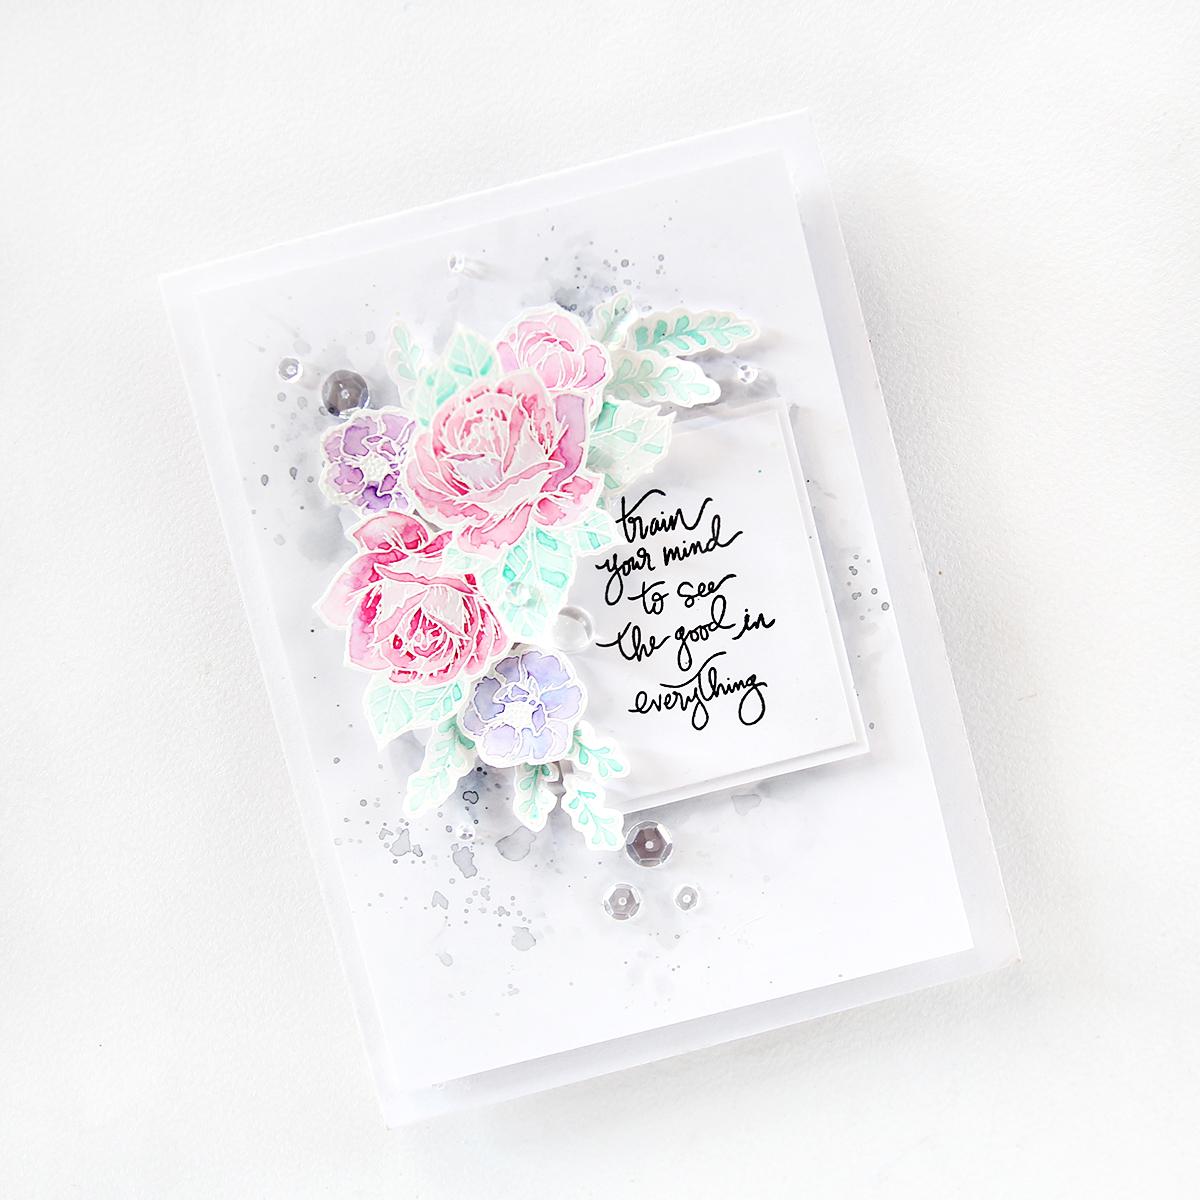 moon flower cool vibes cards with erum  spellbinder blog